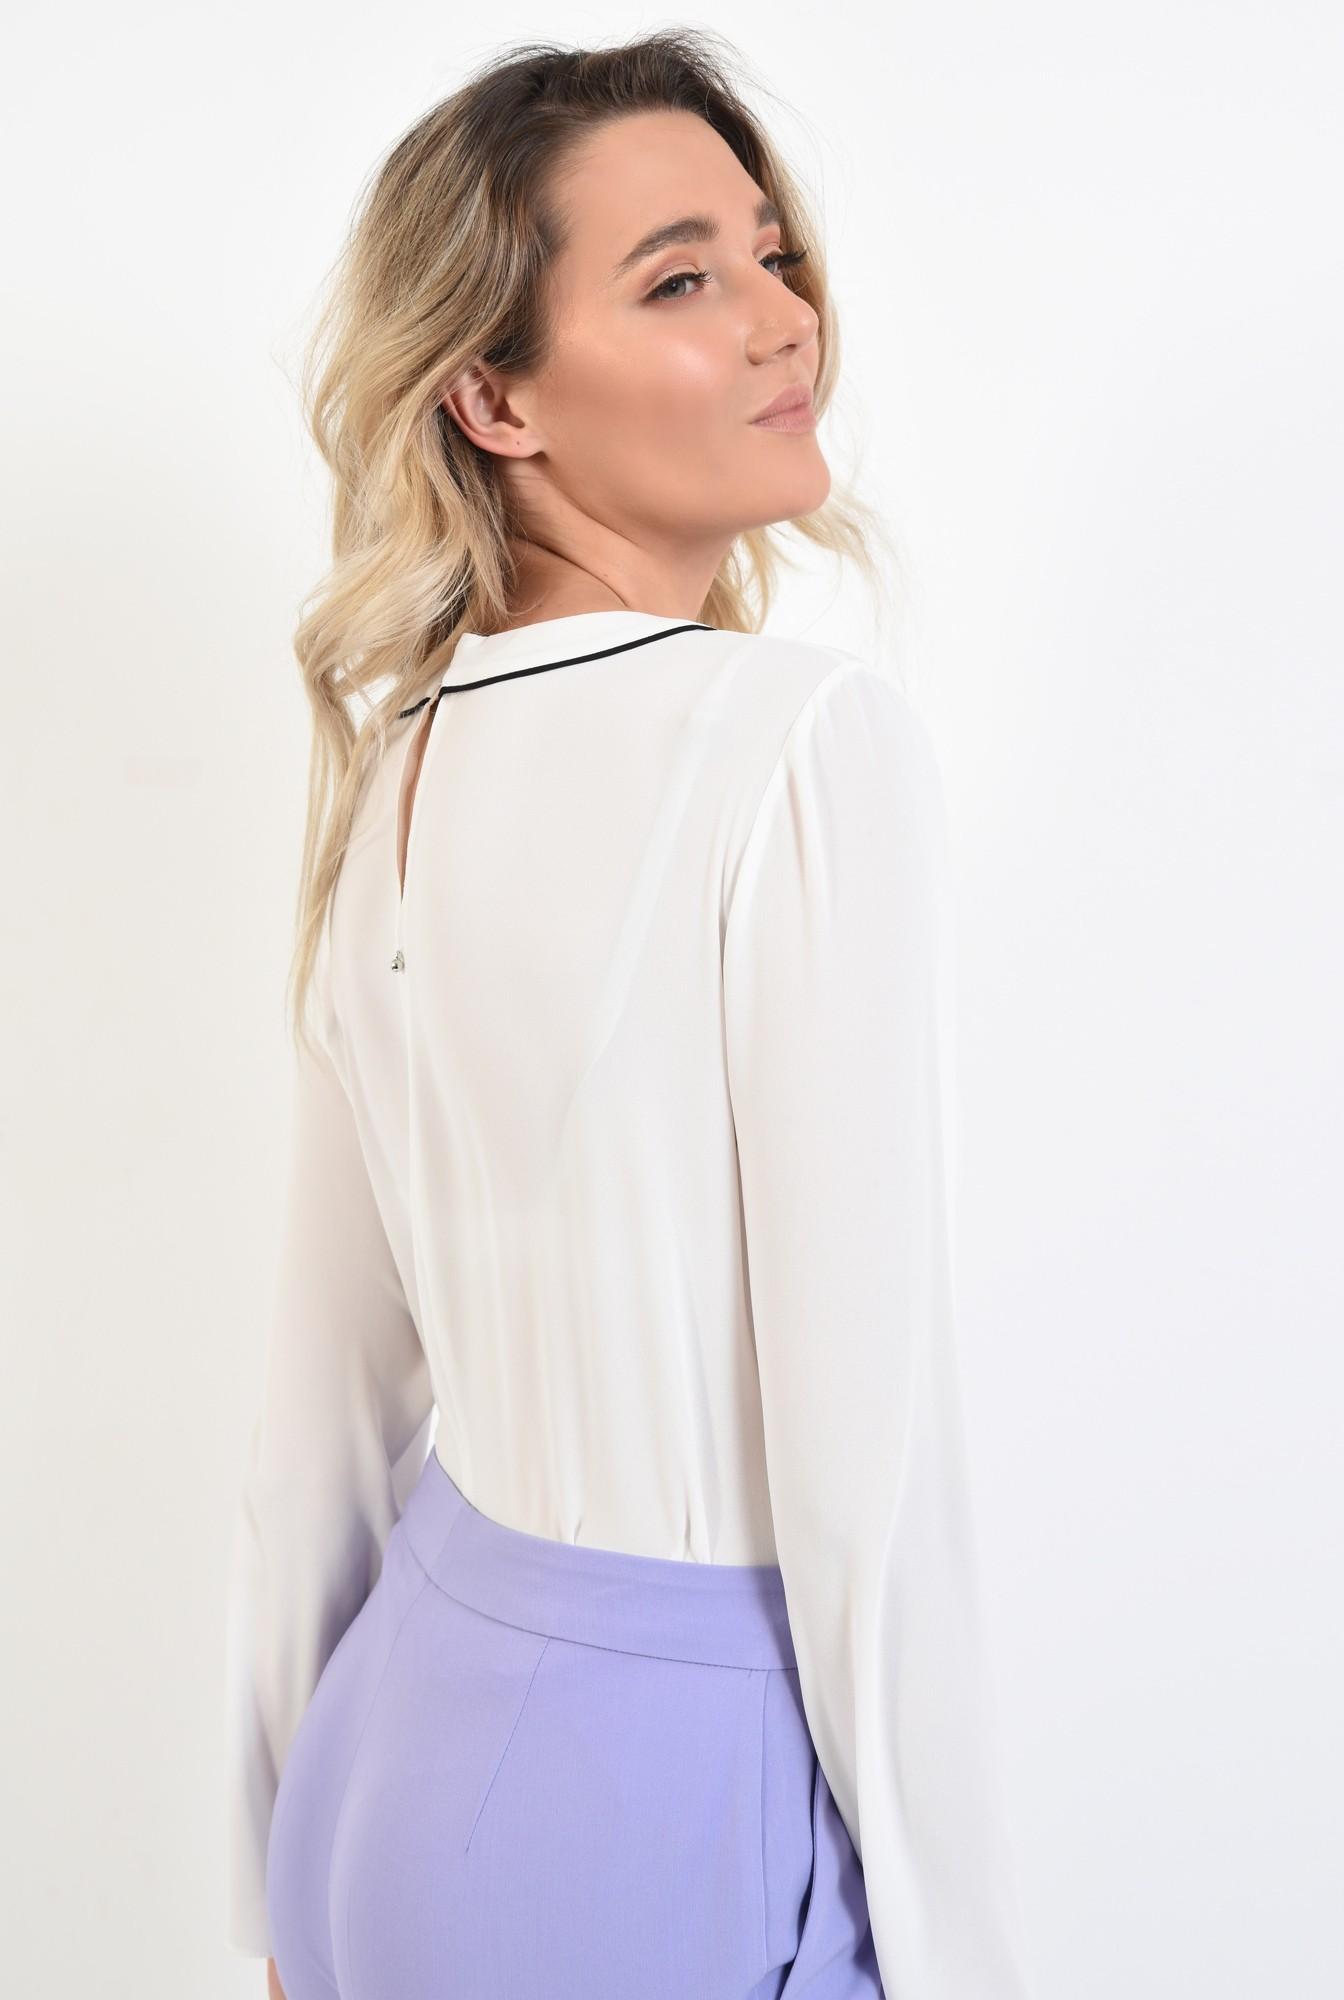 1 - bluza office, maneci lungi, funda cu borduri contrastante, alb, bluza de primavara